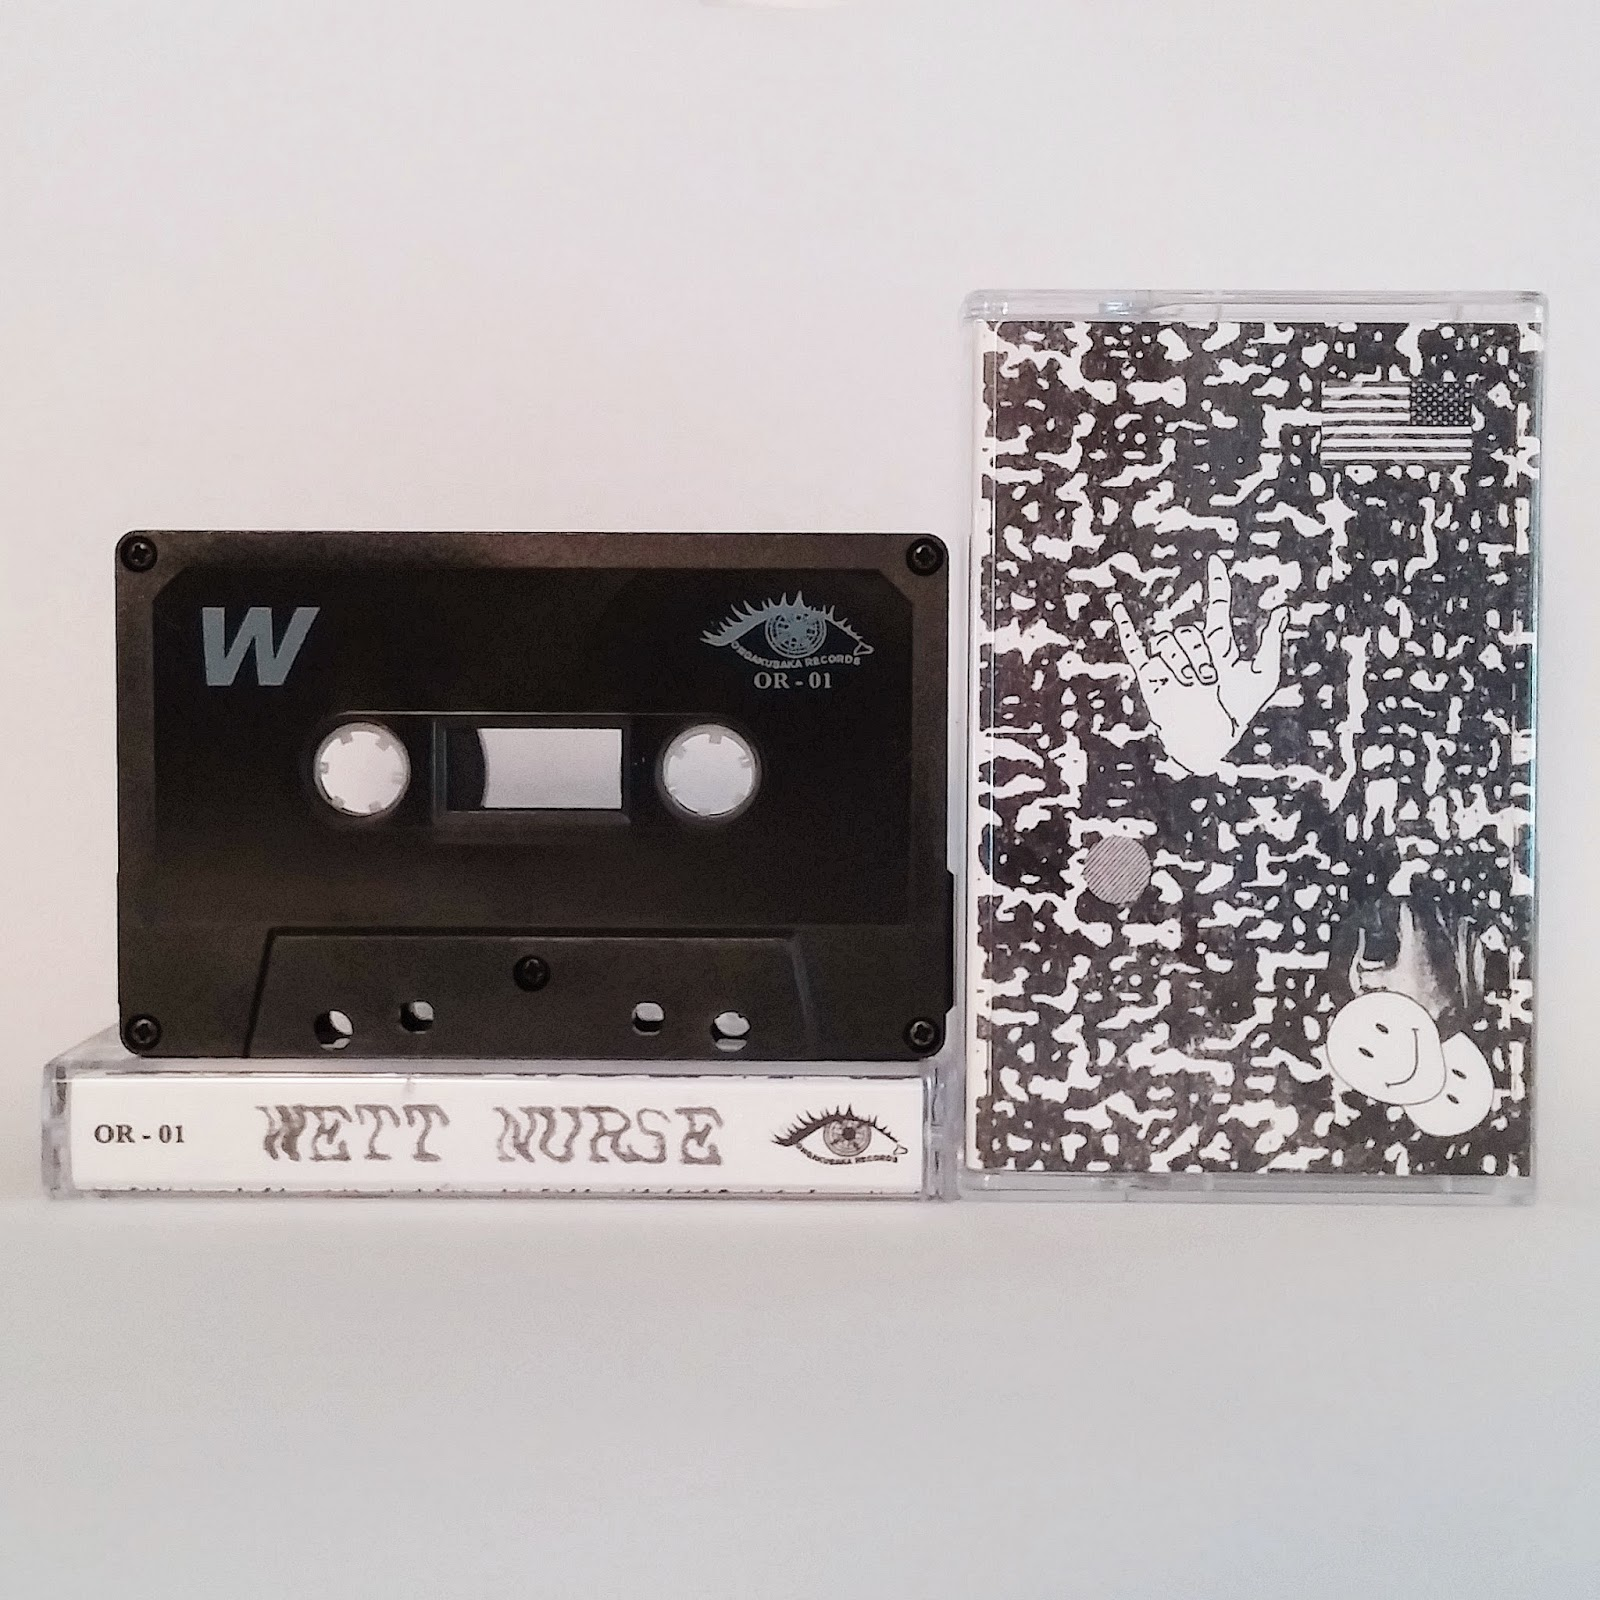 Wett Nurse - Hissy Fit EP